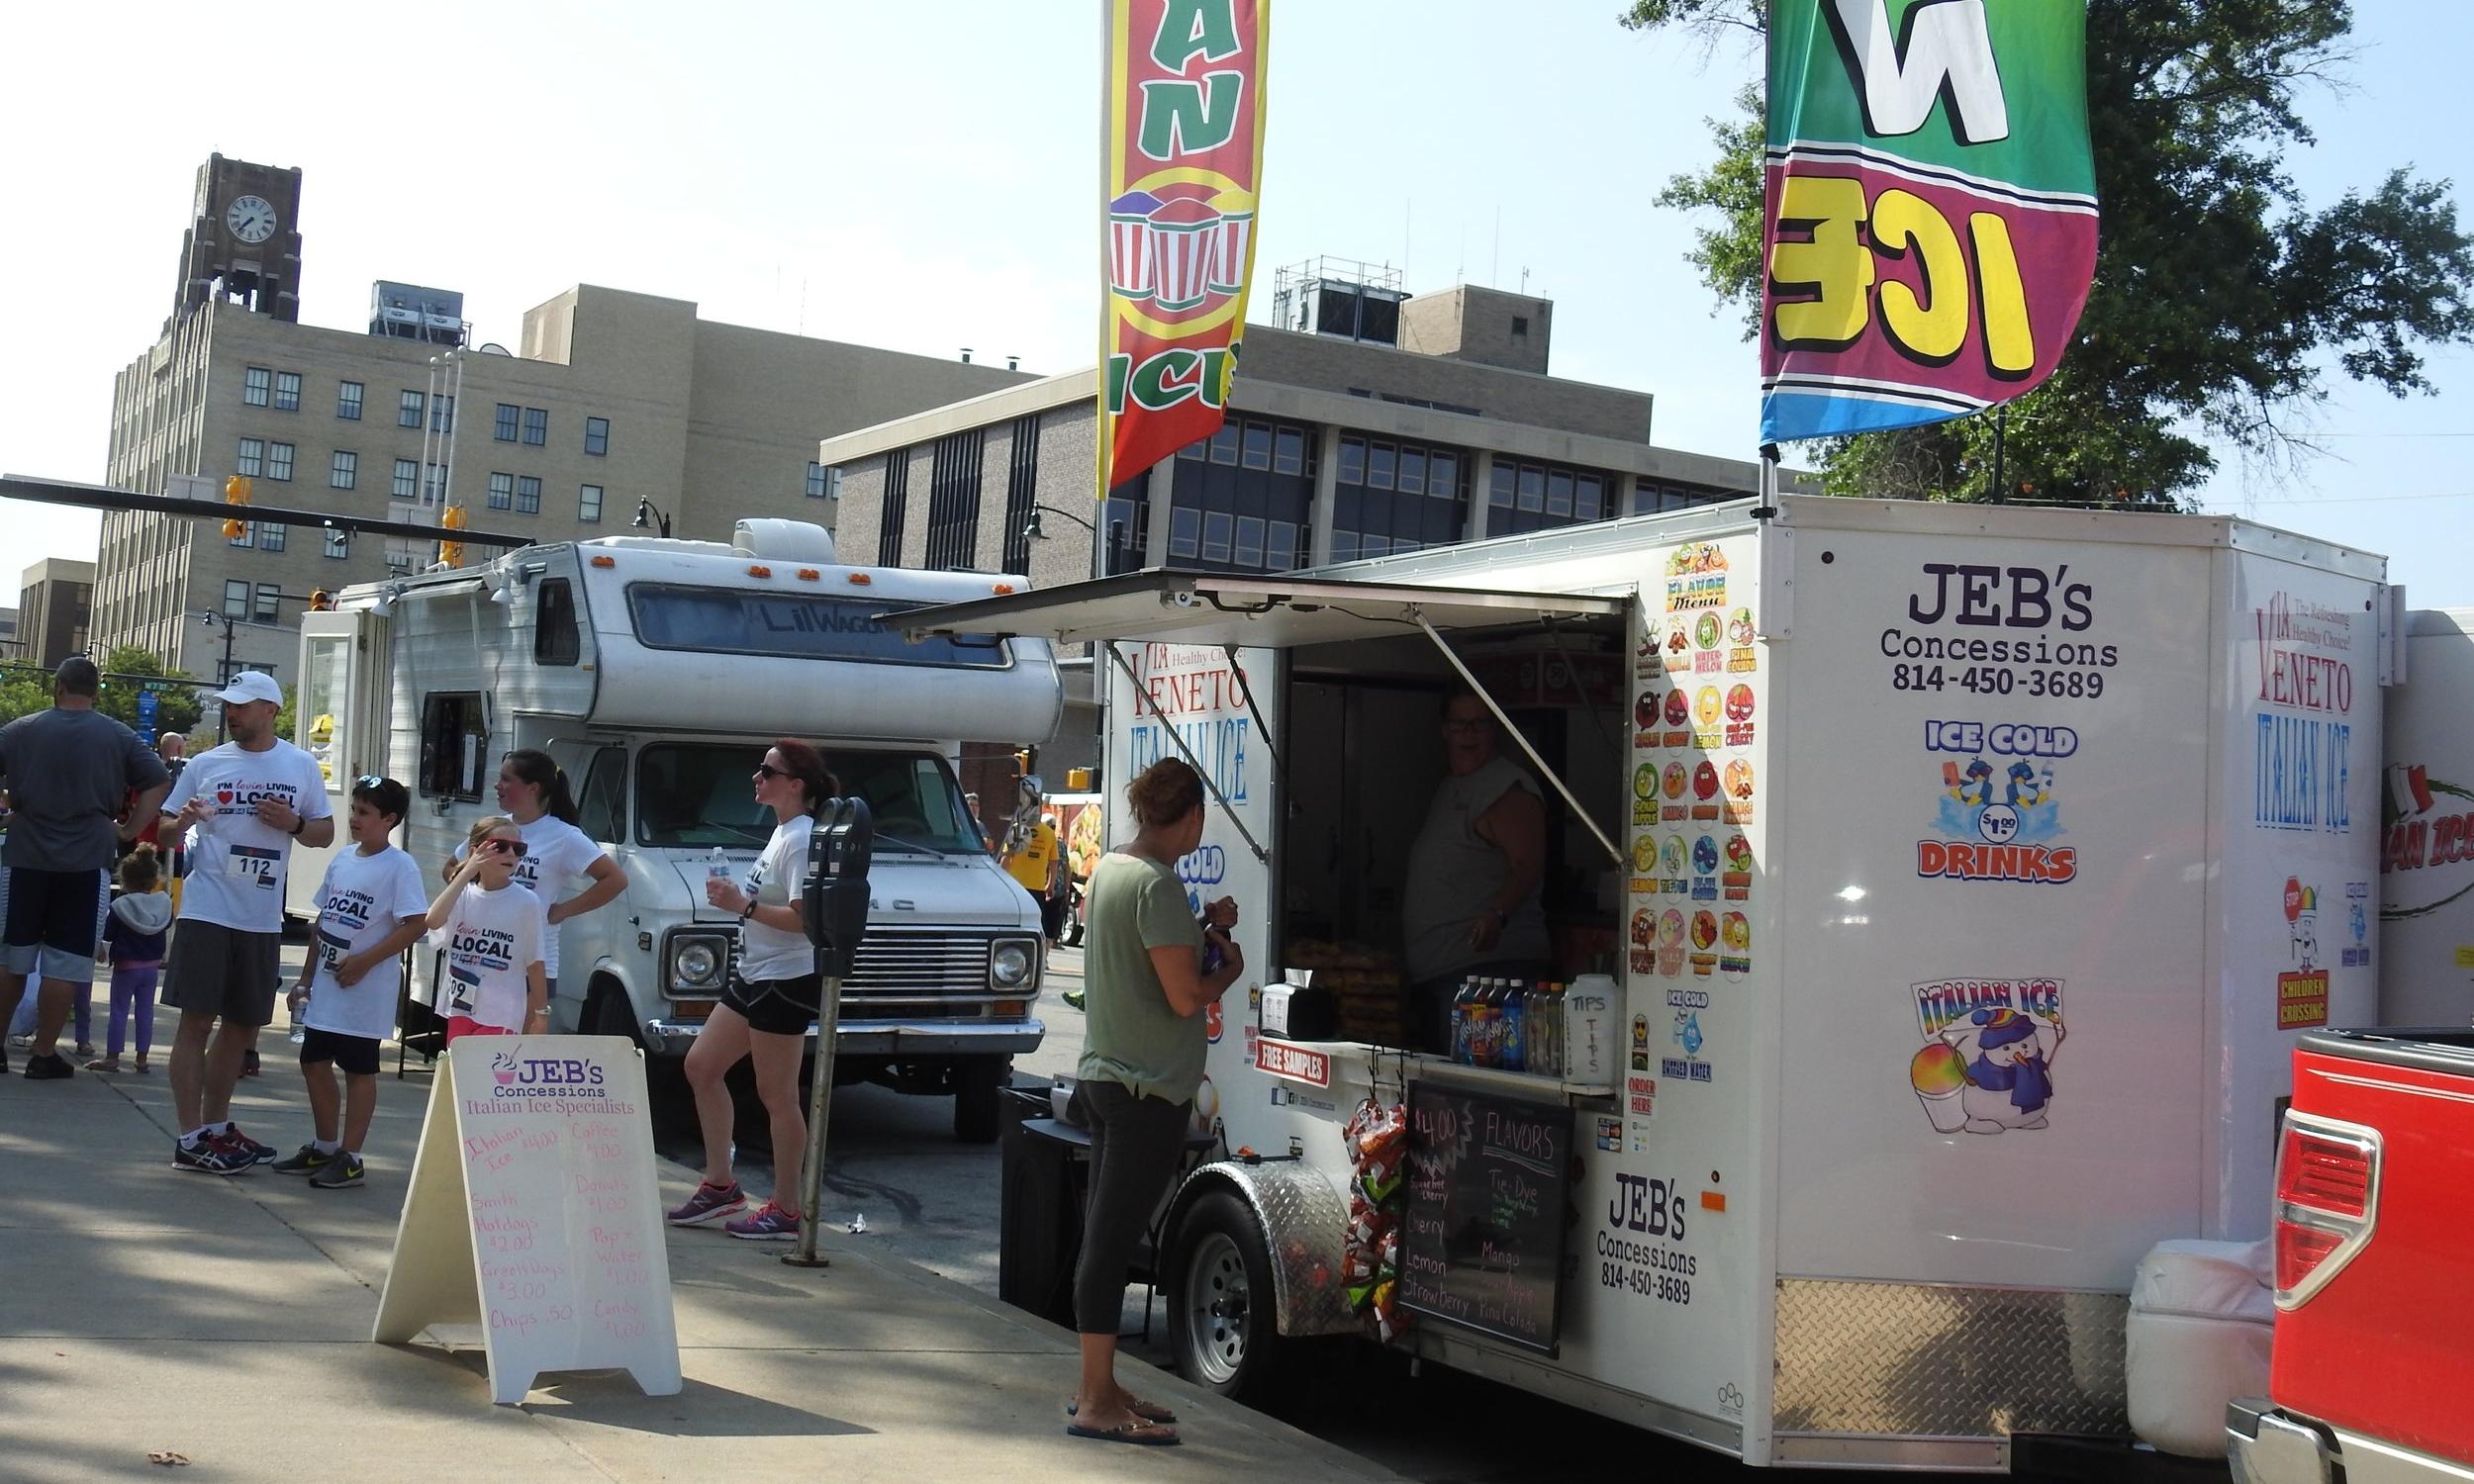 Street Fair - Vendors, instrumental petting zoo, food trucks and more!